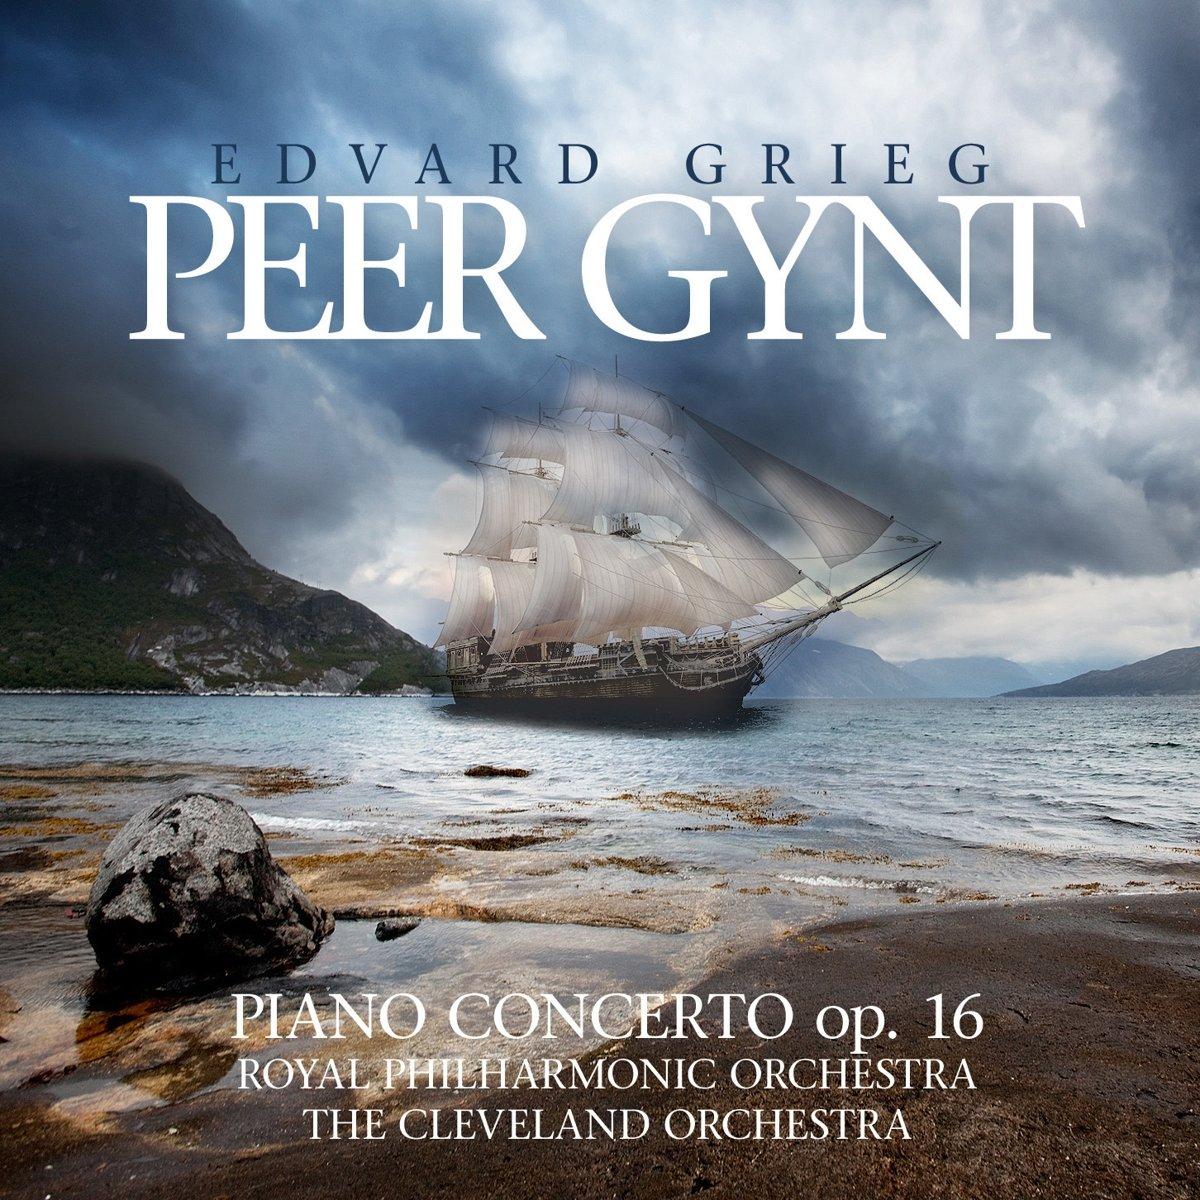 Эдвард Григ Edvard Grieg. Peer Gynt, Piano Concerto (2 CD) edvard grieg 23 little piano pieces